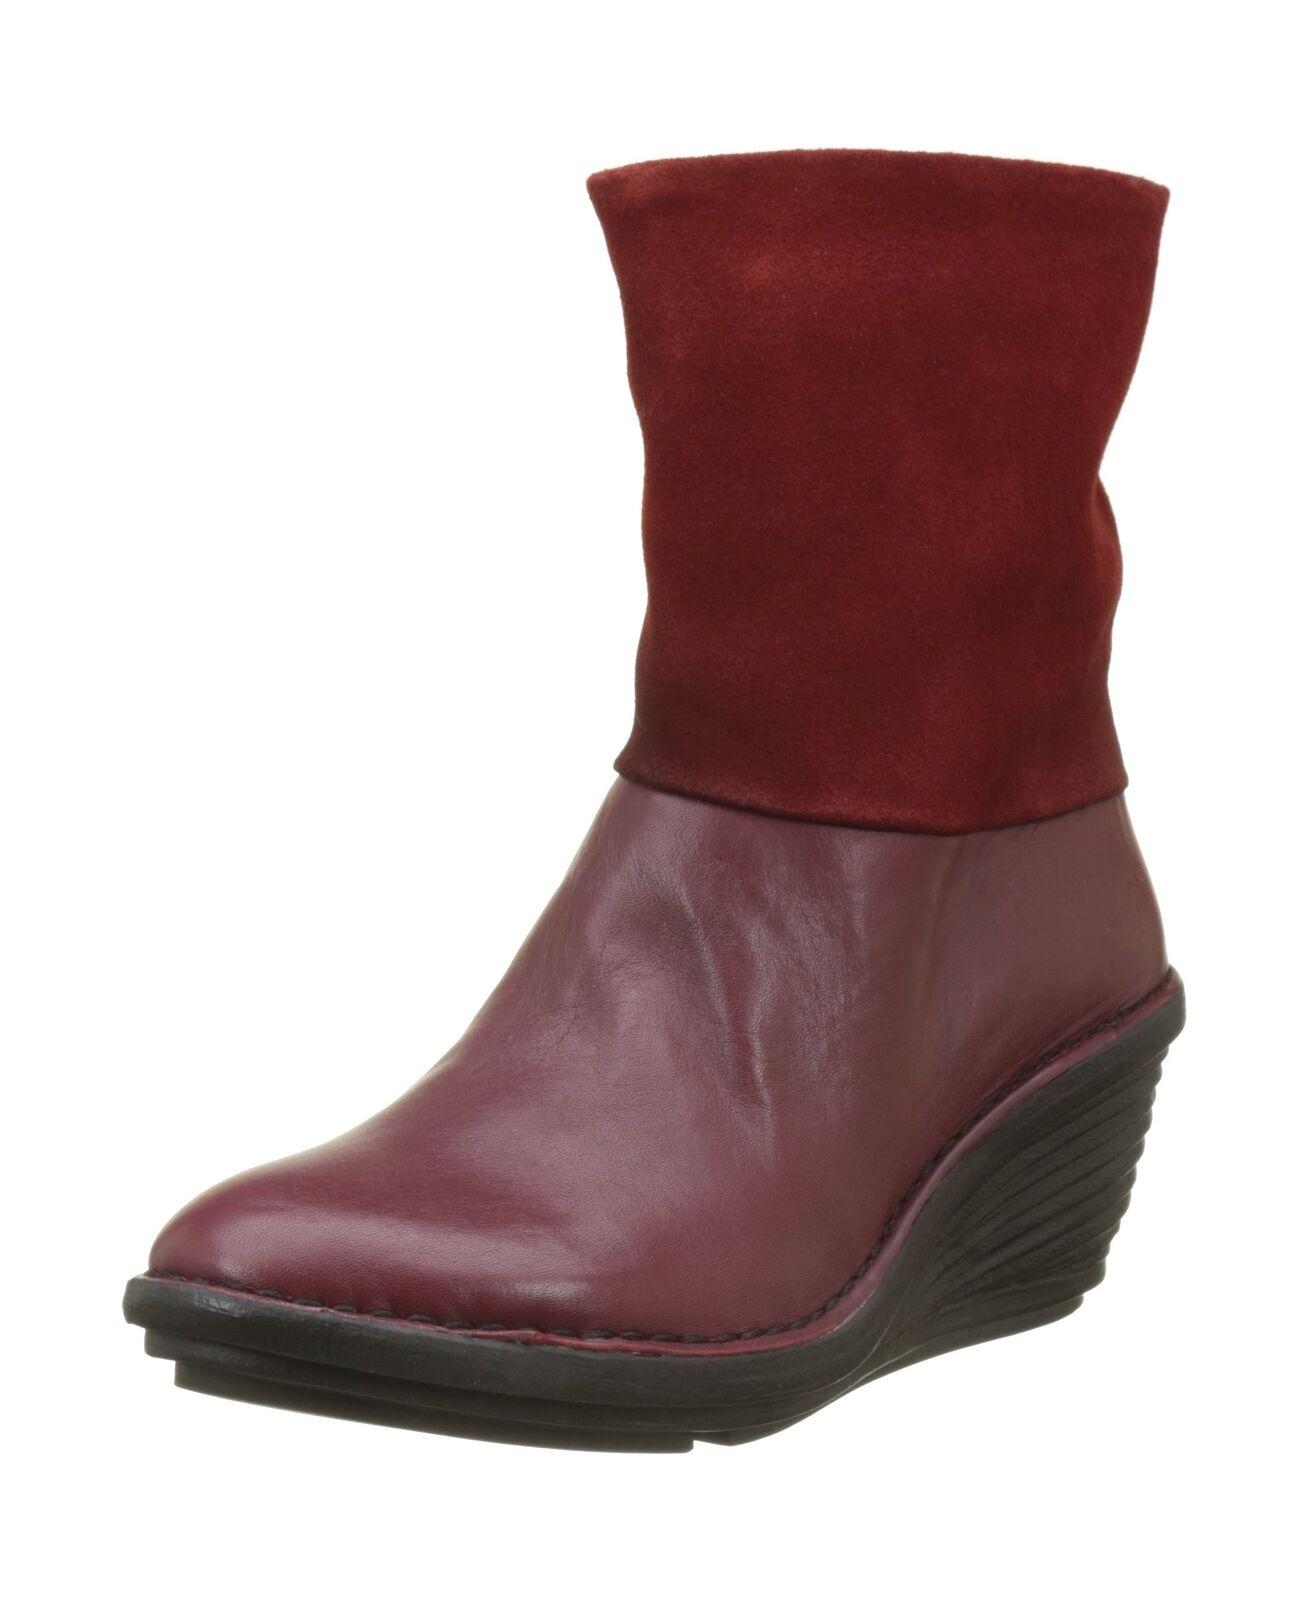 Fly London Women's Sina671fly Boots Red (Cordoba (Cordoba (Cordoba Red) 4 UK 8c109d